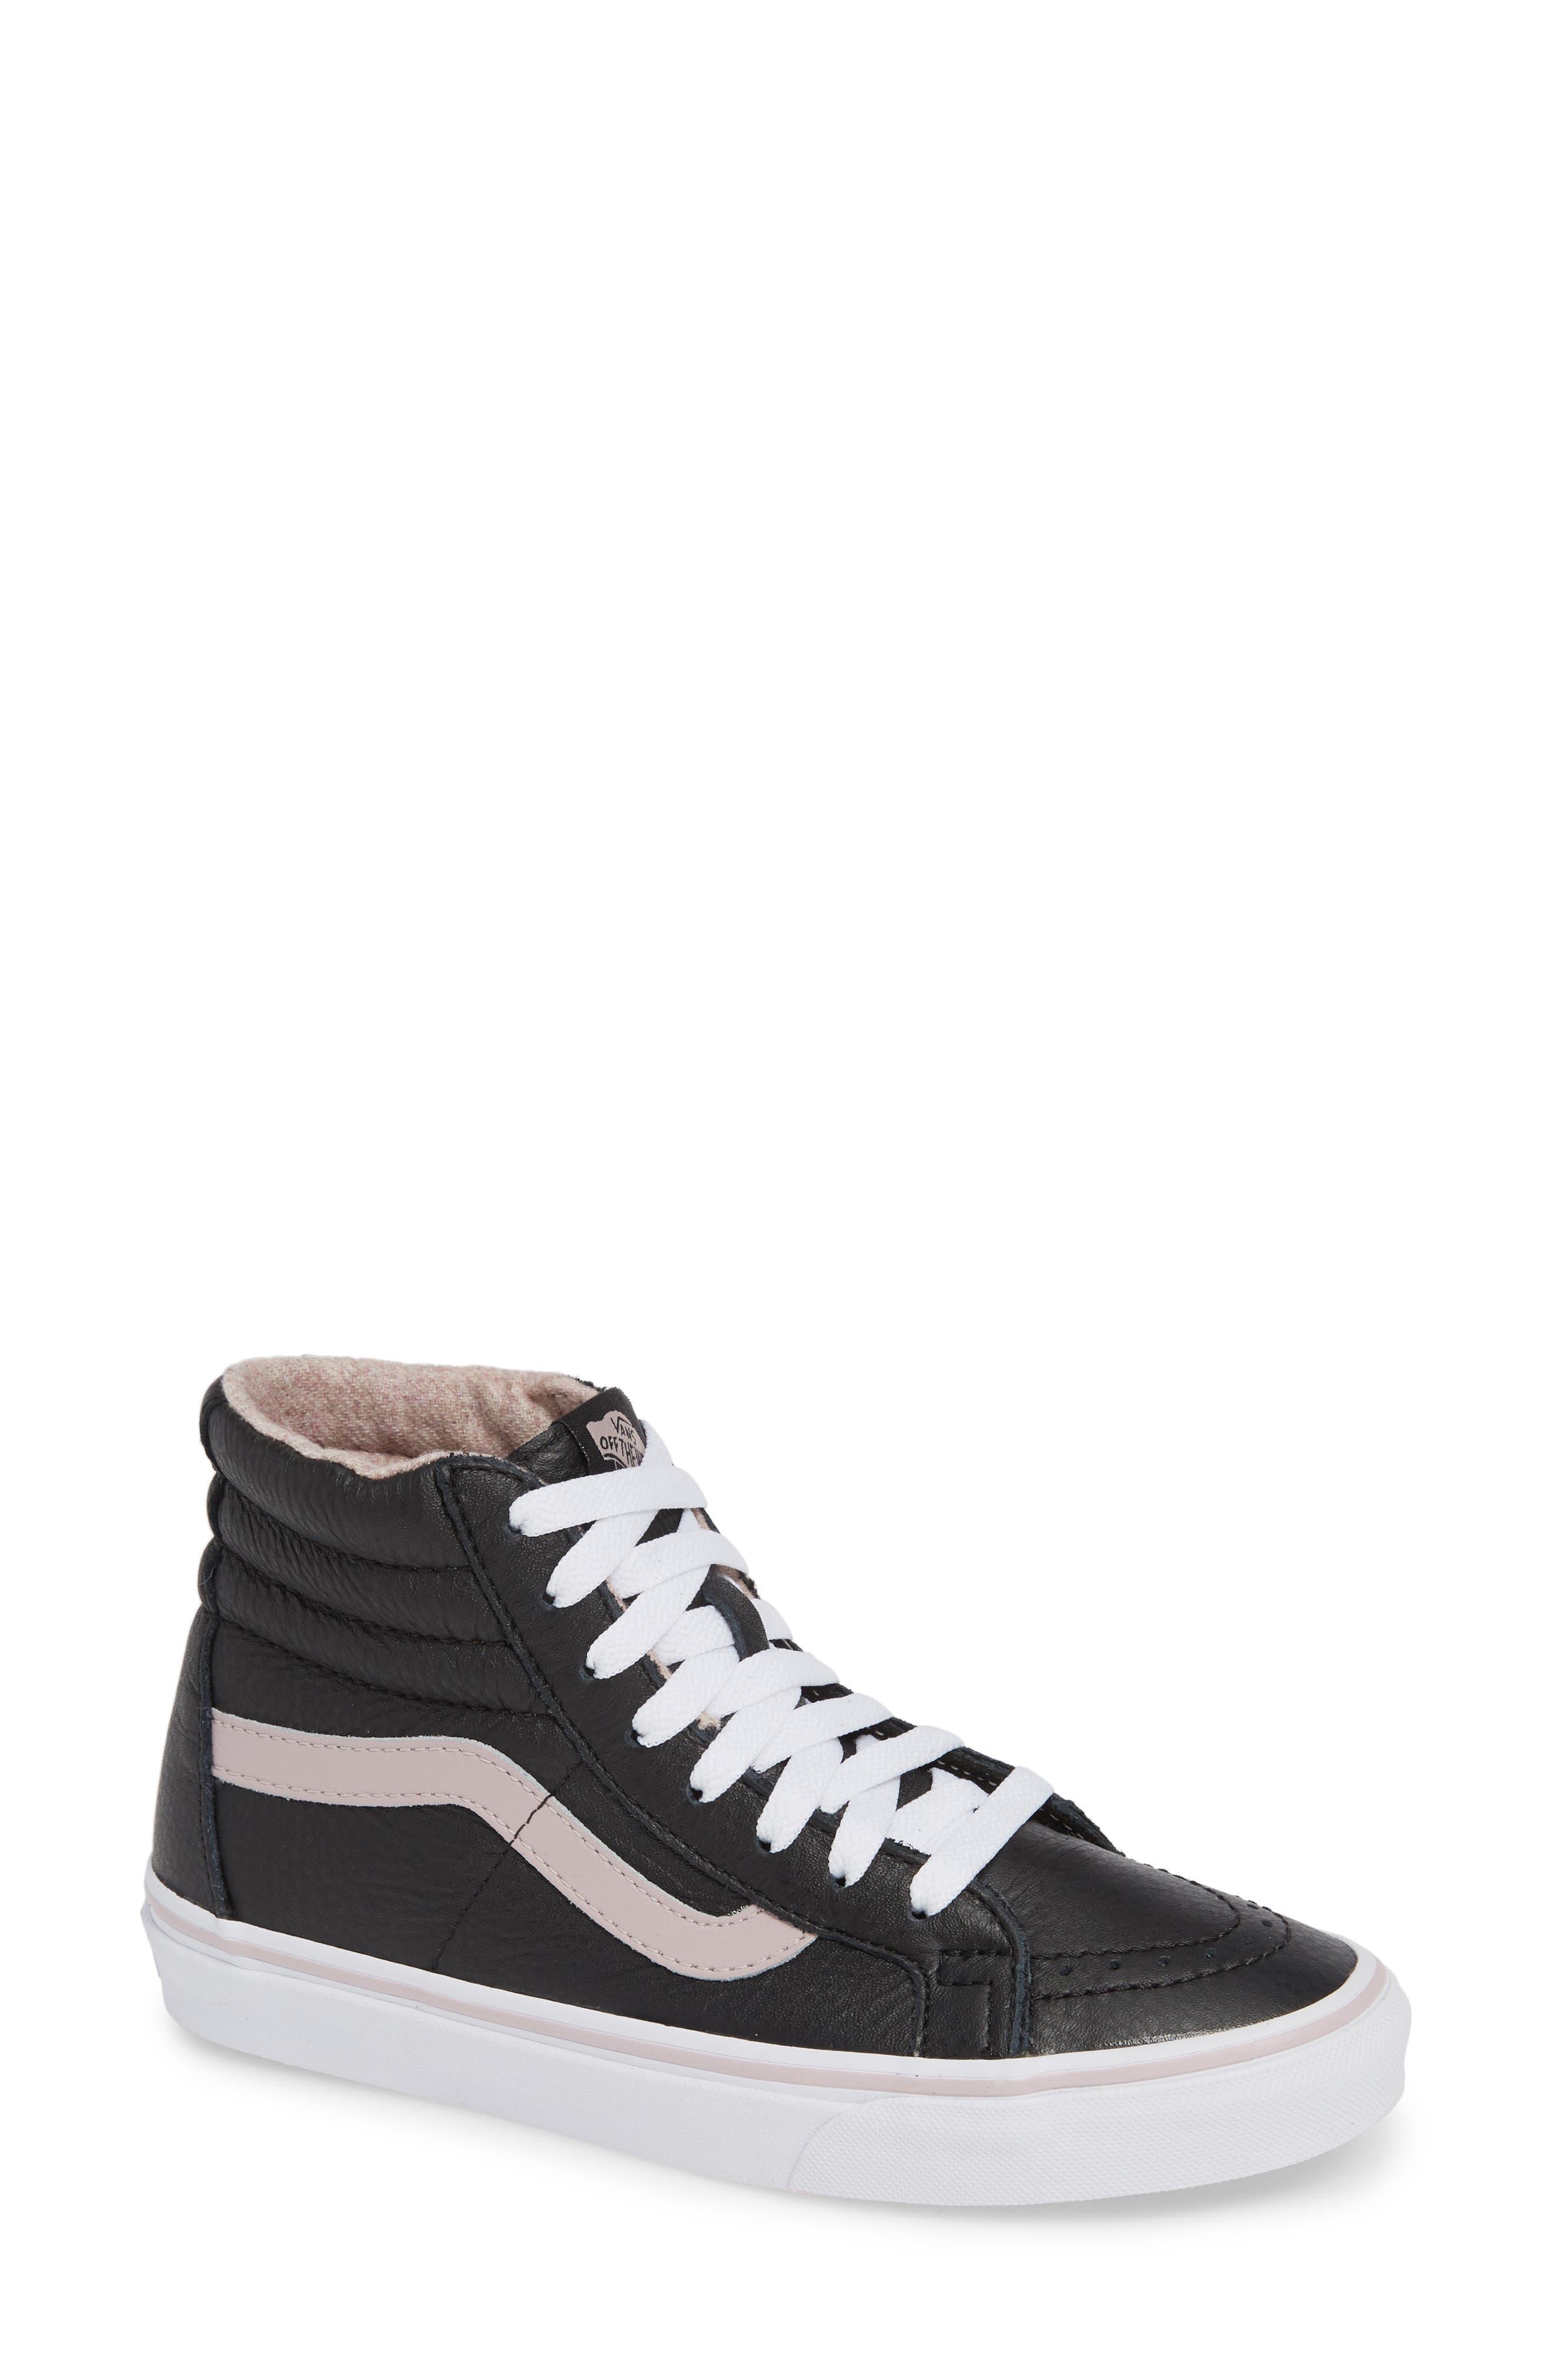 VANS,                             Sk8-Hi Reissue Sneaker,                             Main thumbnail 1, color,                             001